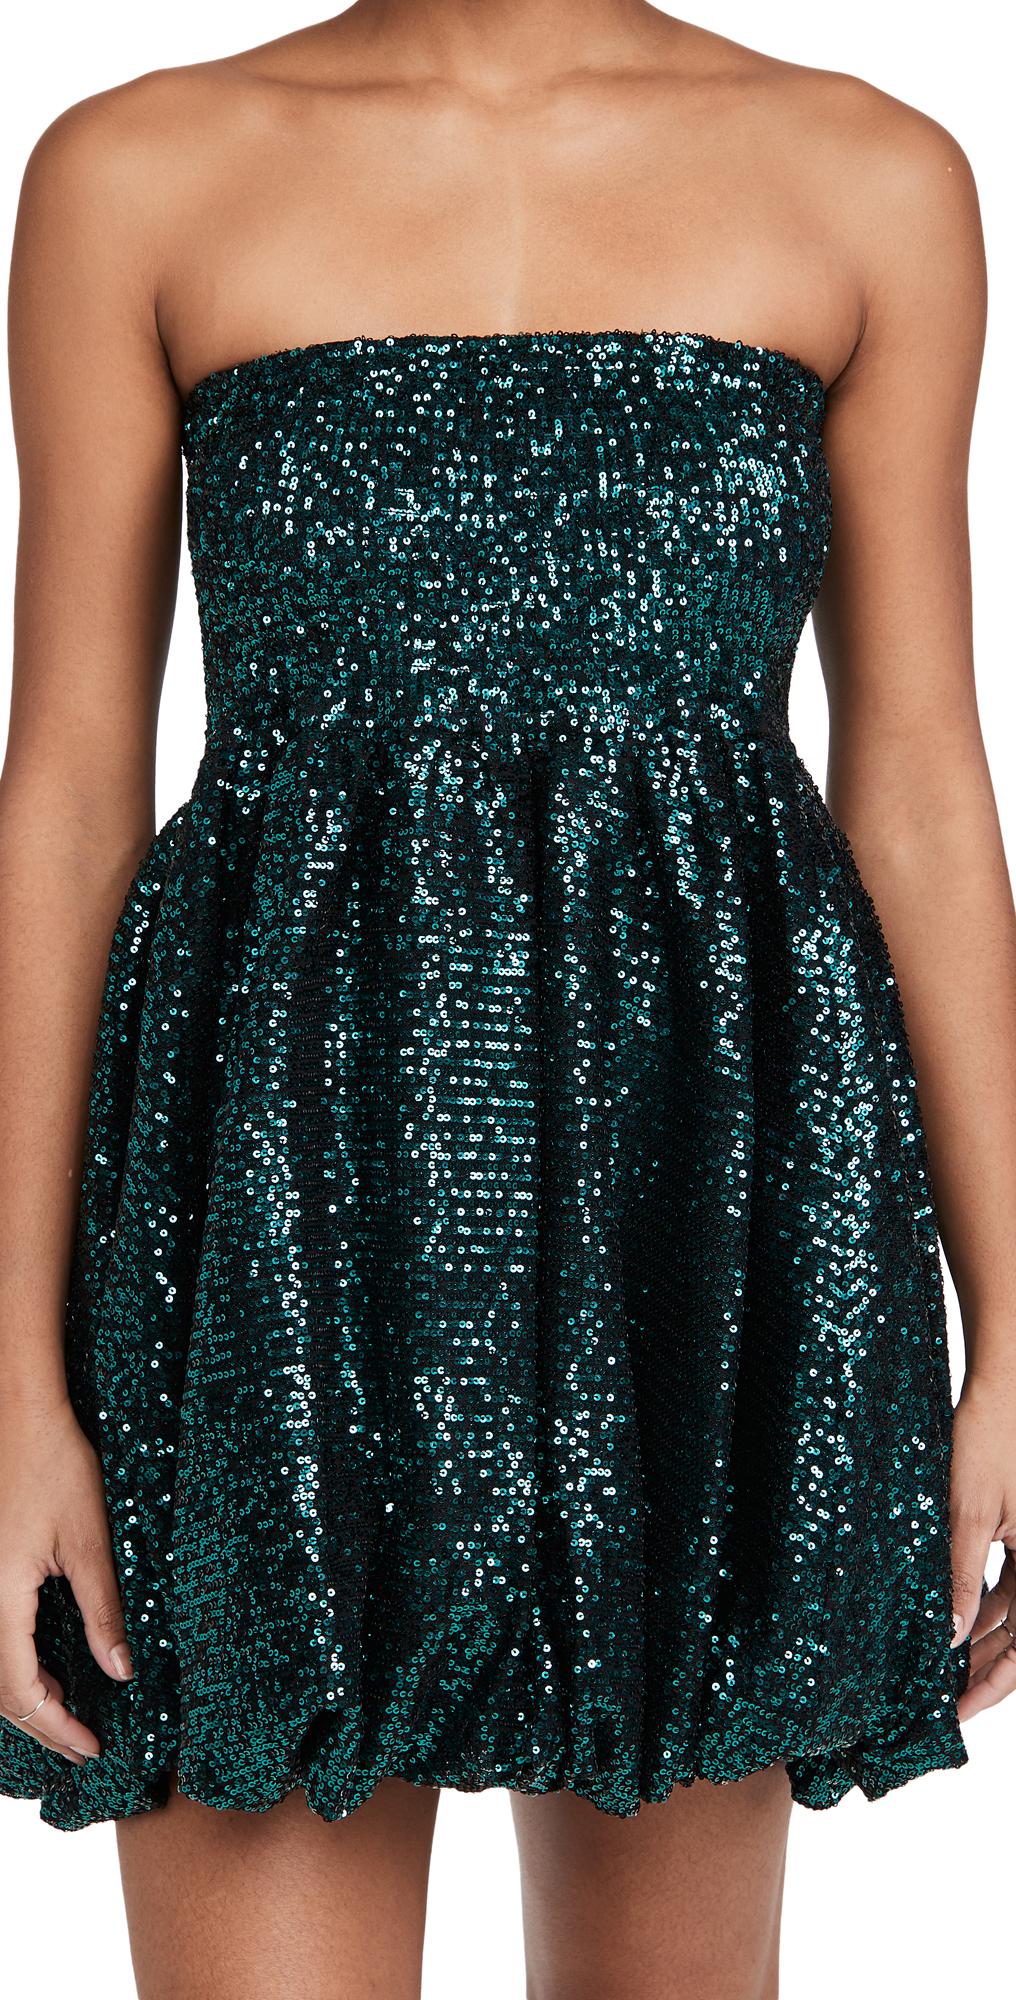 Caroline Constas Bianca Sequin Dress